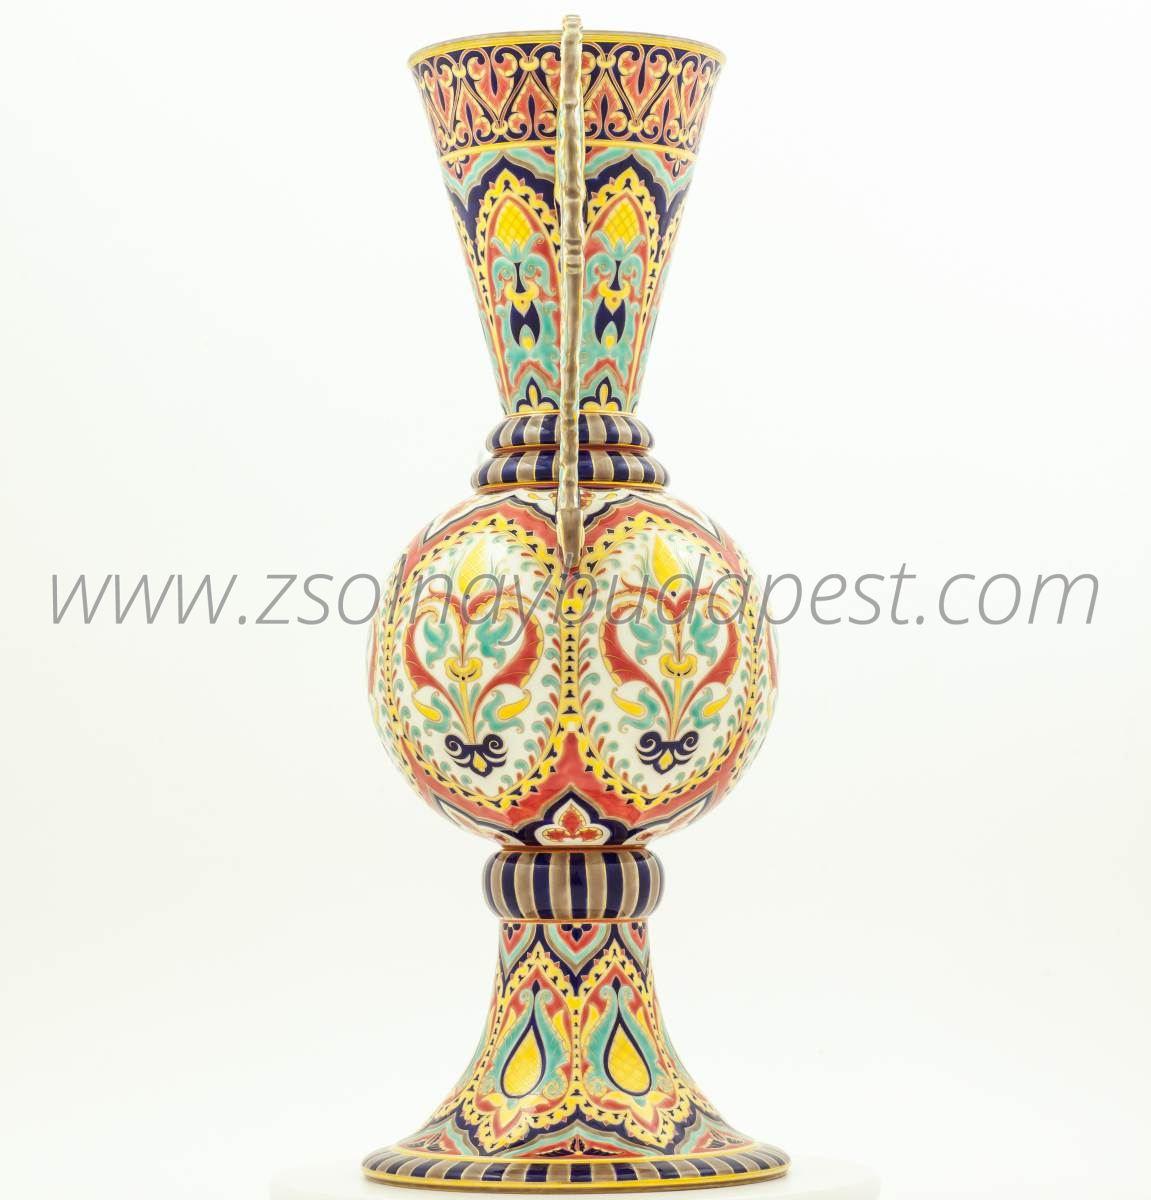 Limited edition Alhambra vase 4/10